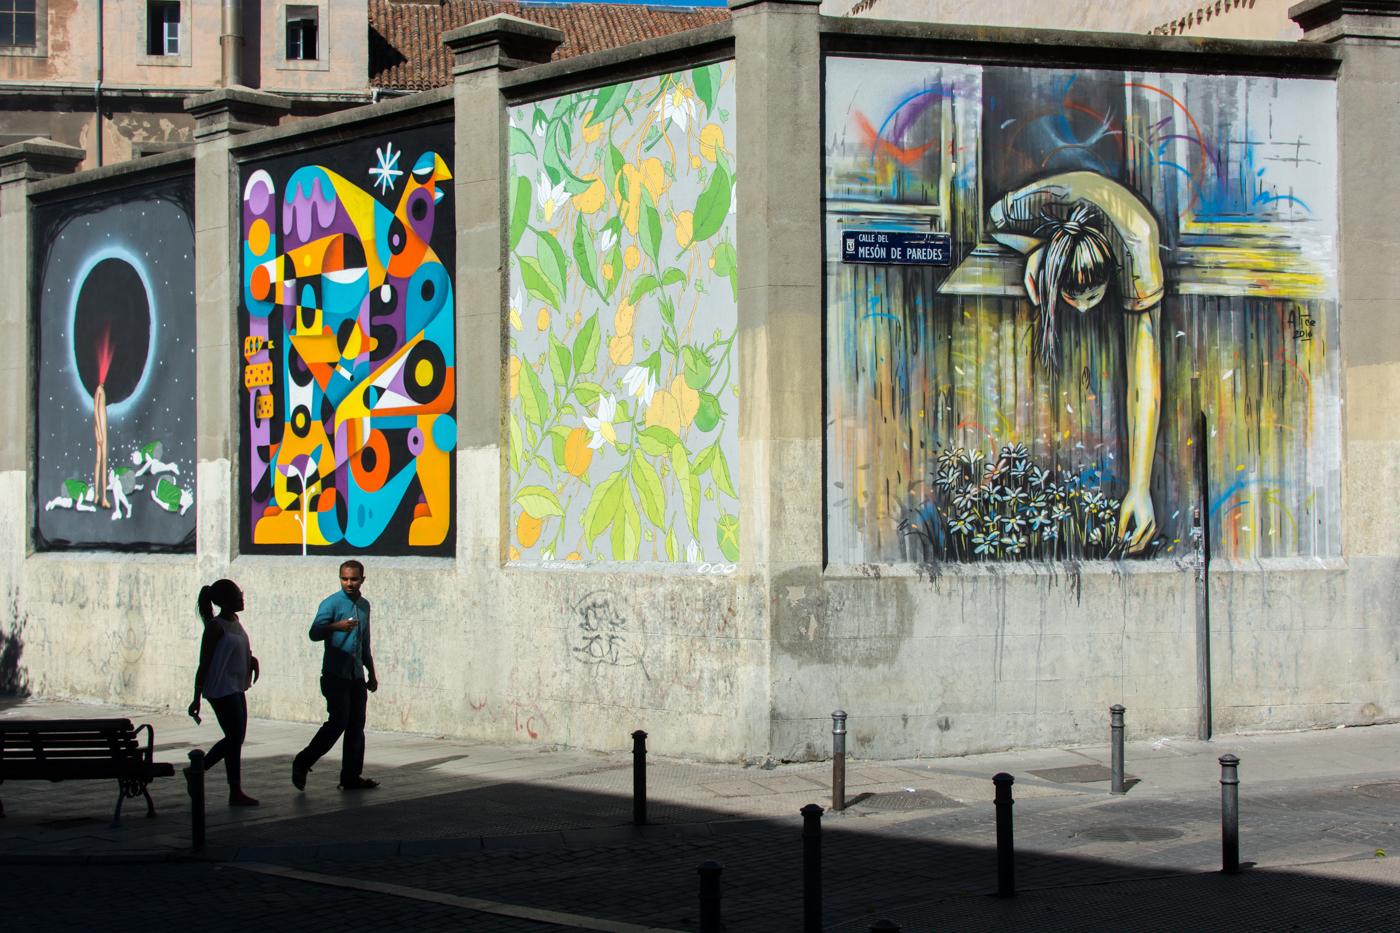 AlicePasquini Doa Oa Ruben Sanchez Conjunto final _MurosTabacalera by Guillermo de la Madrid - Madrid Street Art Project-544.jpg